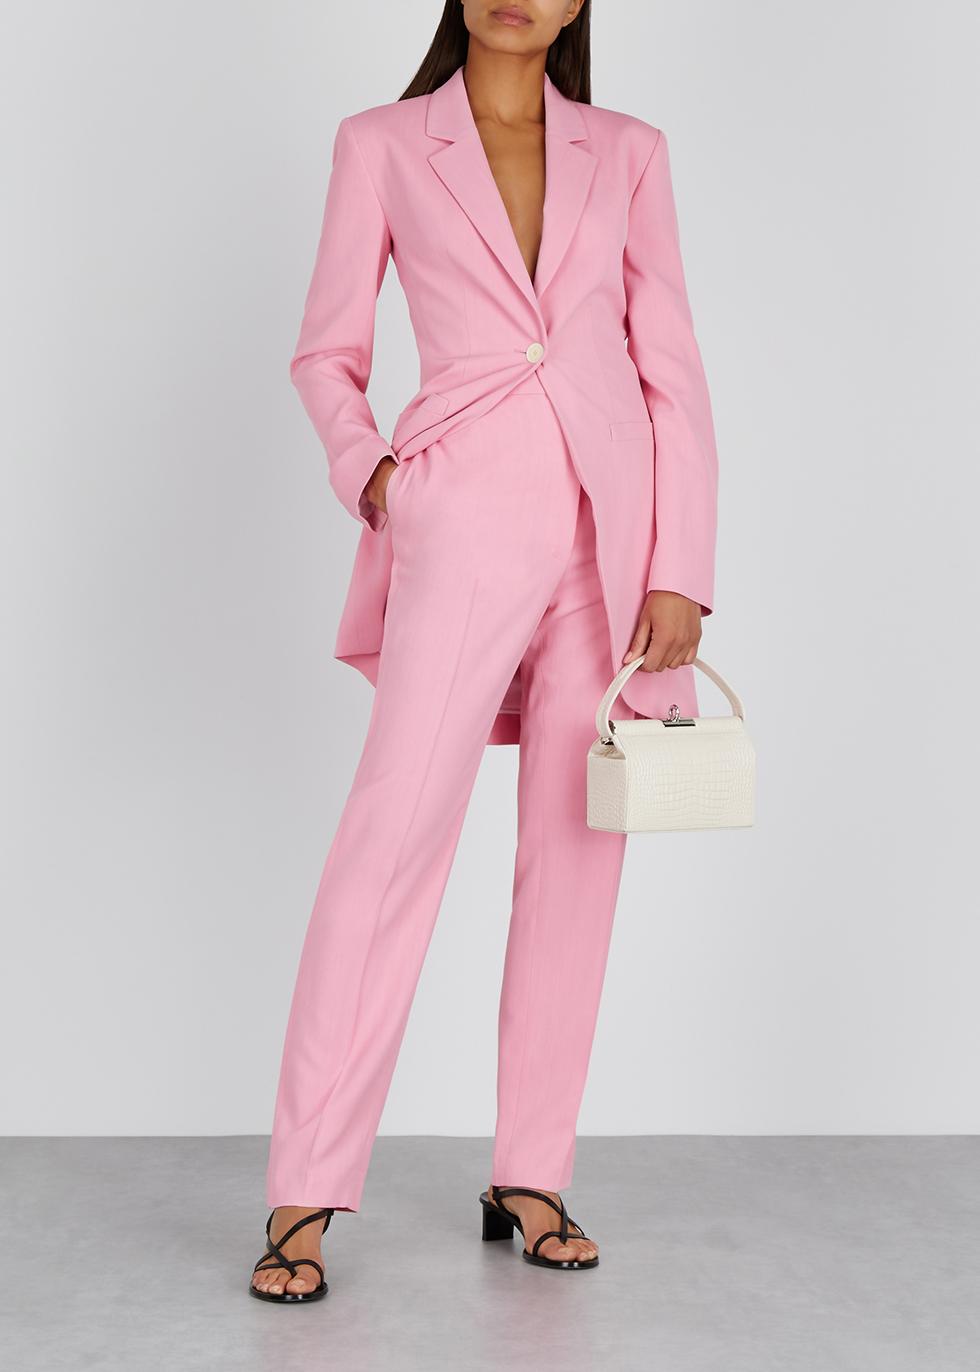 Pink longline twill blazer - Loewe